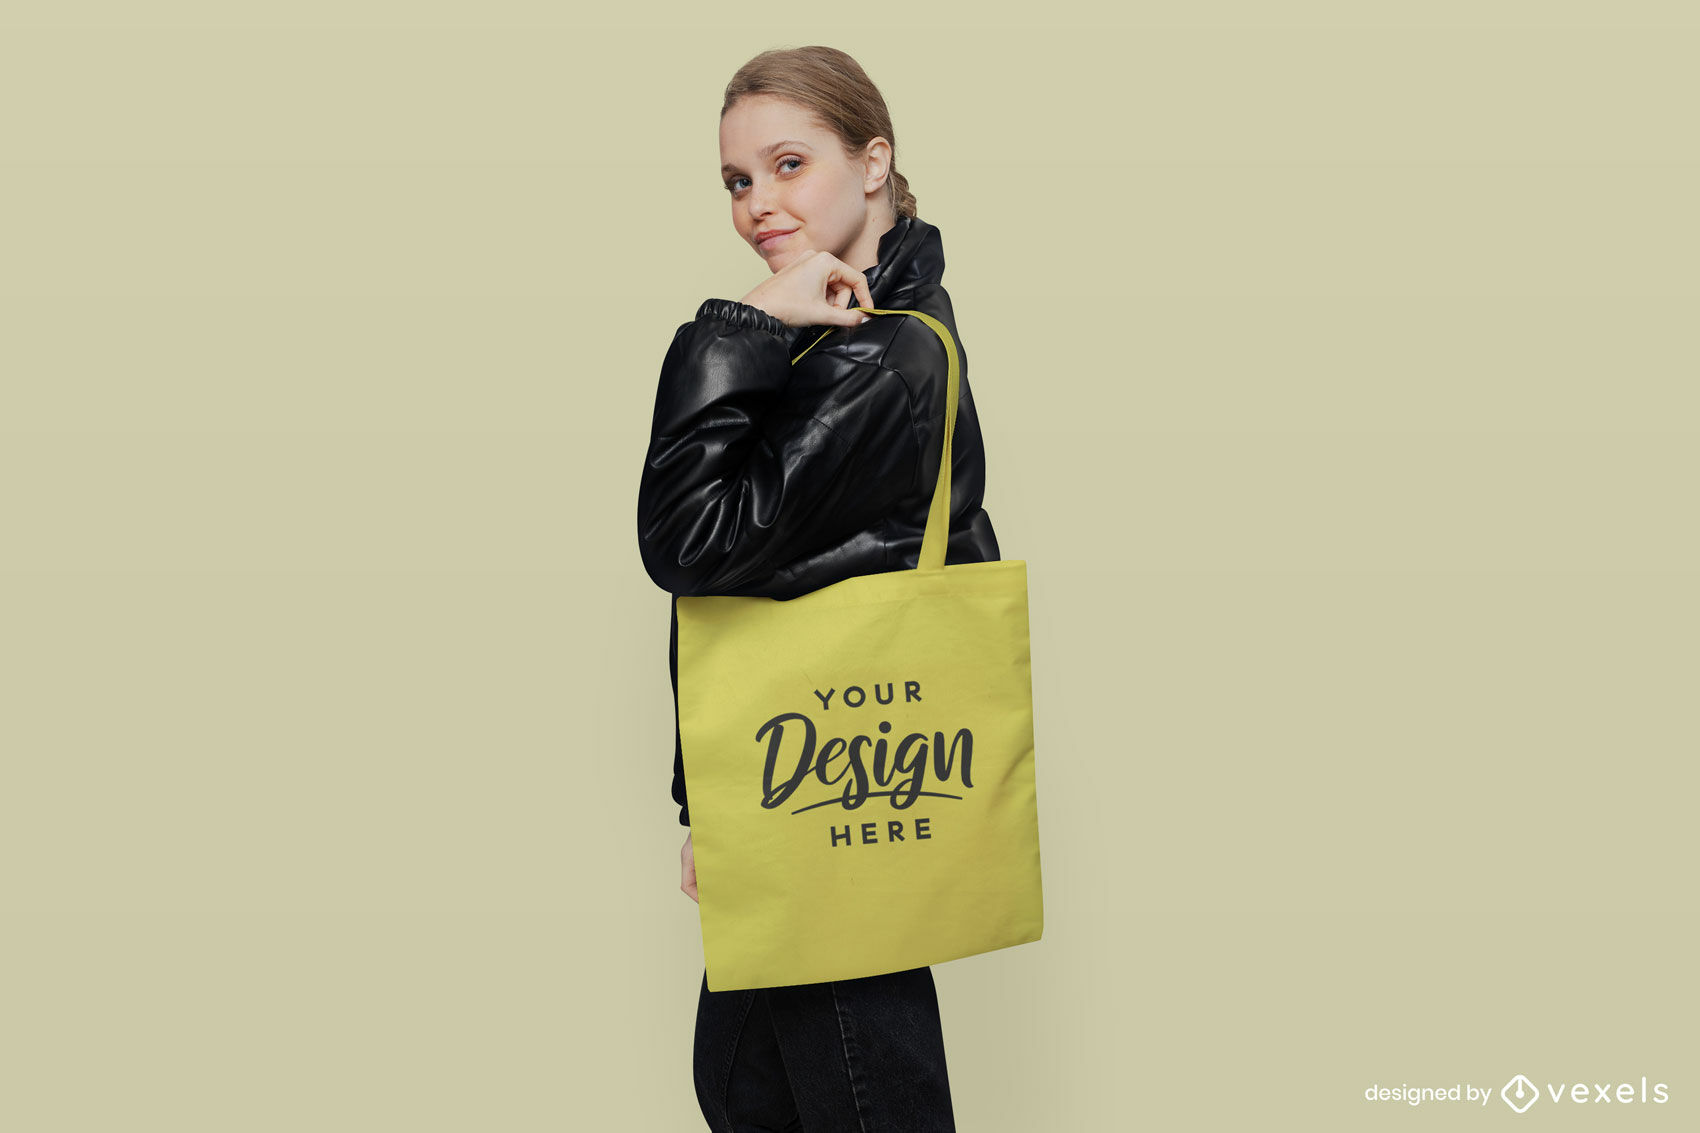 Bolso tote amarillo chica en maqueta de chaqueta negra